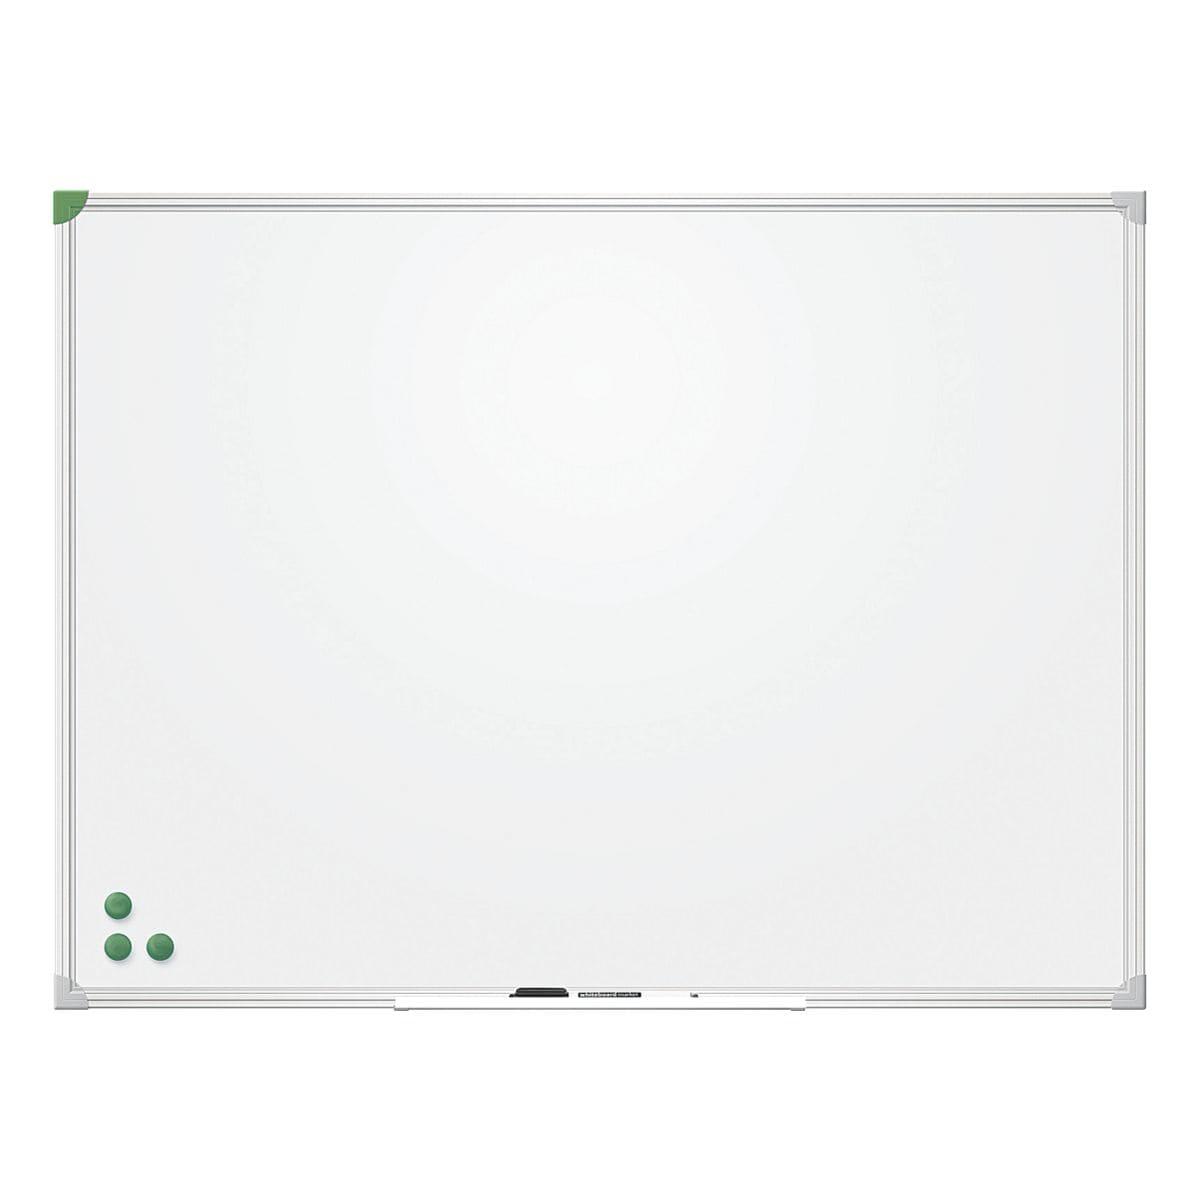 Franken Whiteboard U-Act! Line SC916080 lackiert, 80x60 cm